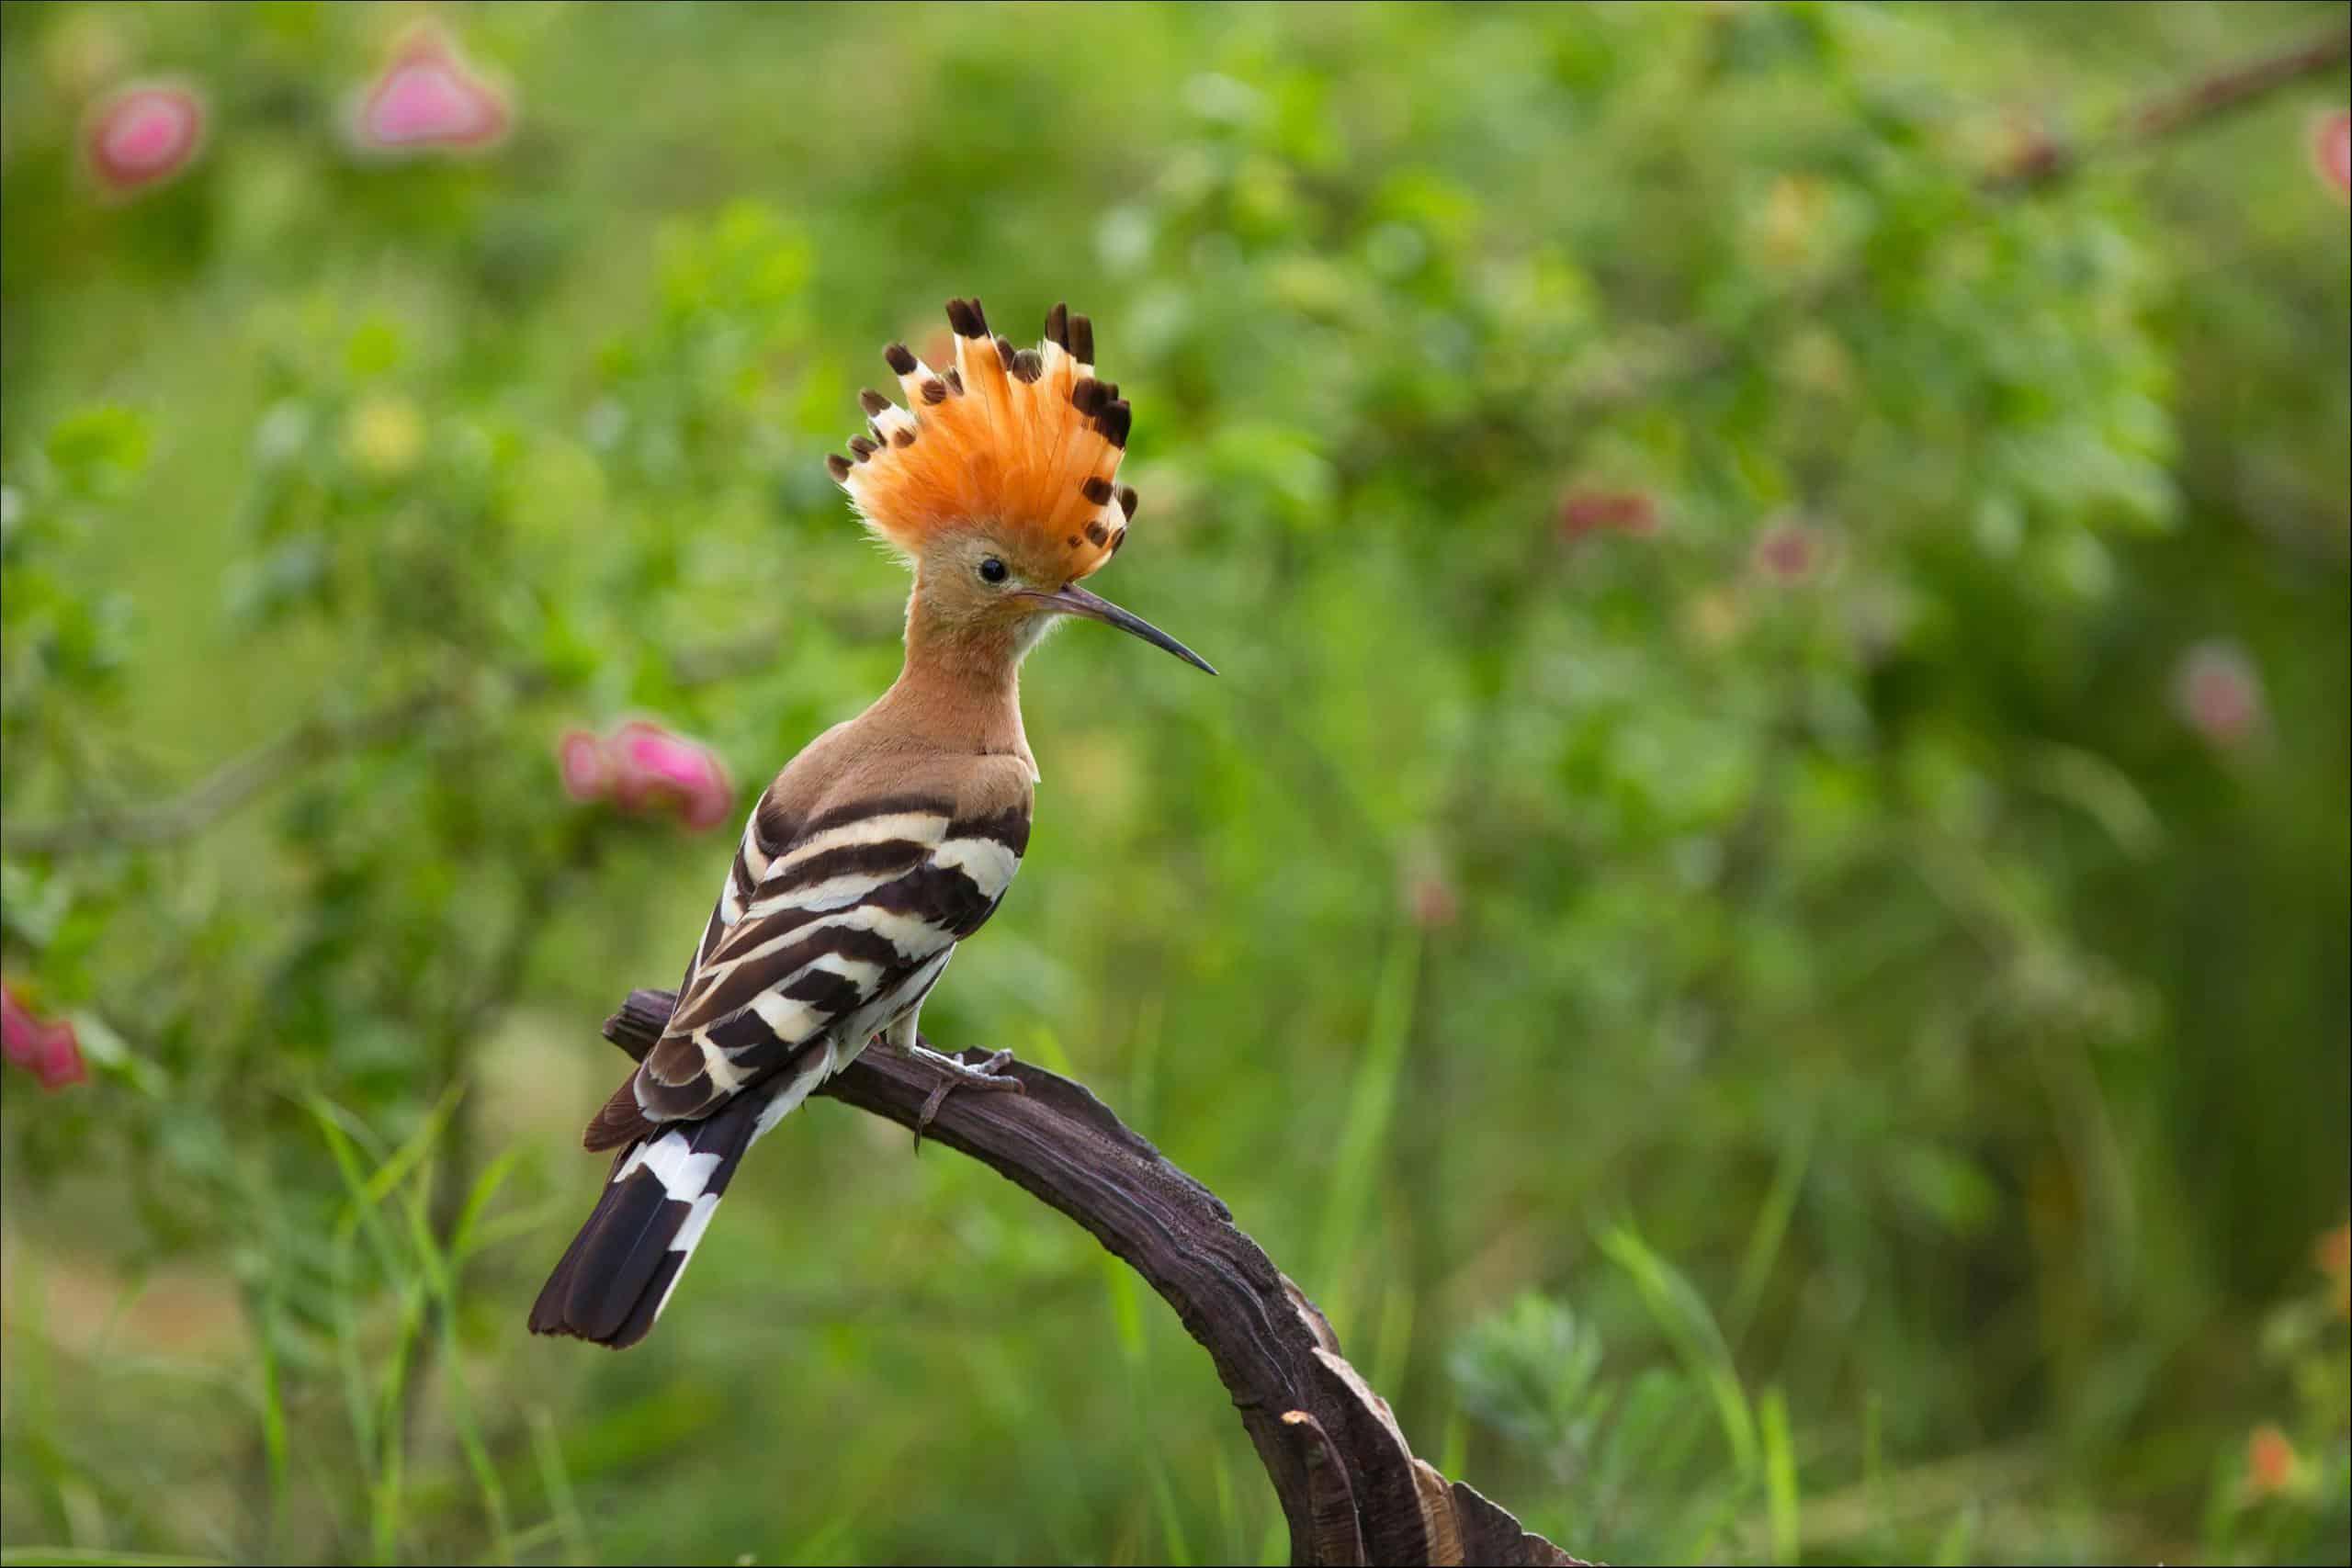 hoopoe (Upupa) hoopoe on a branch